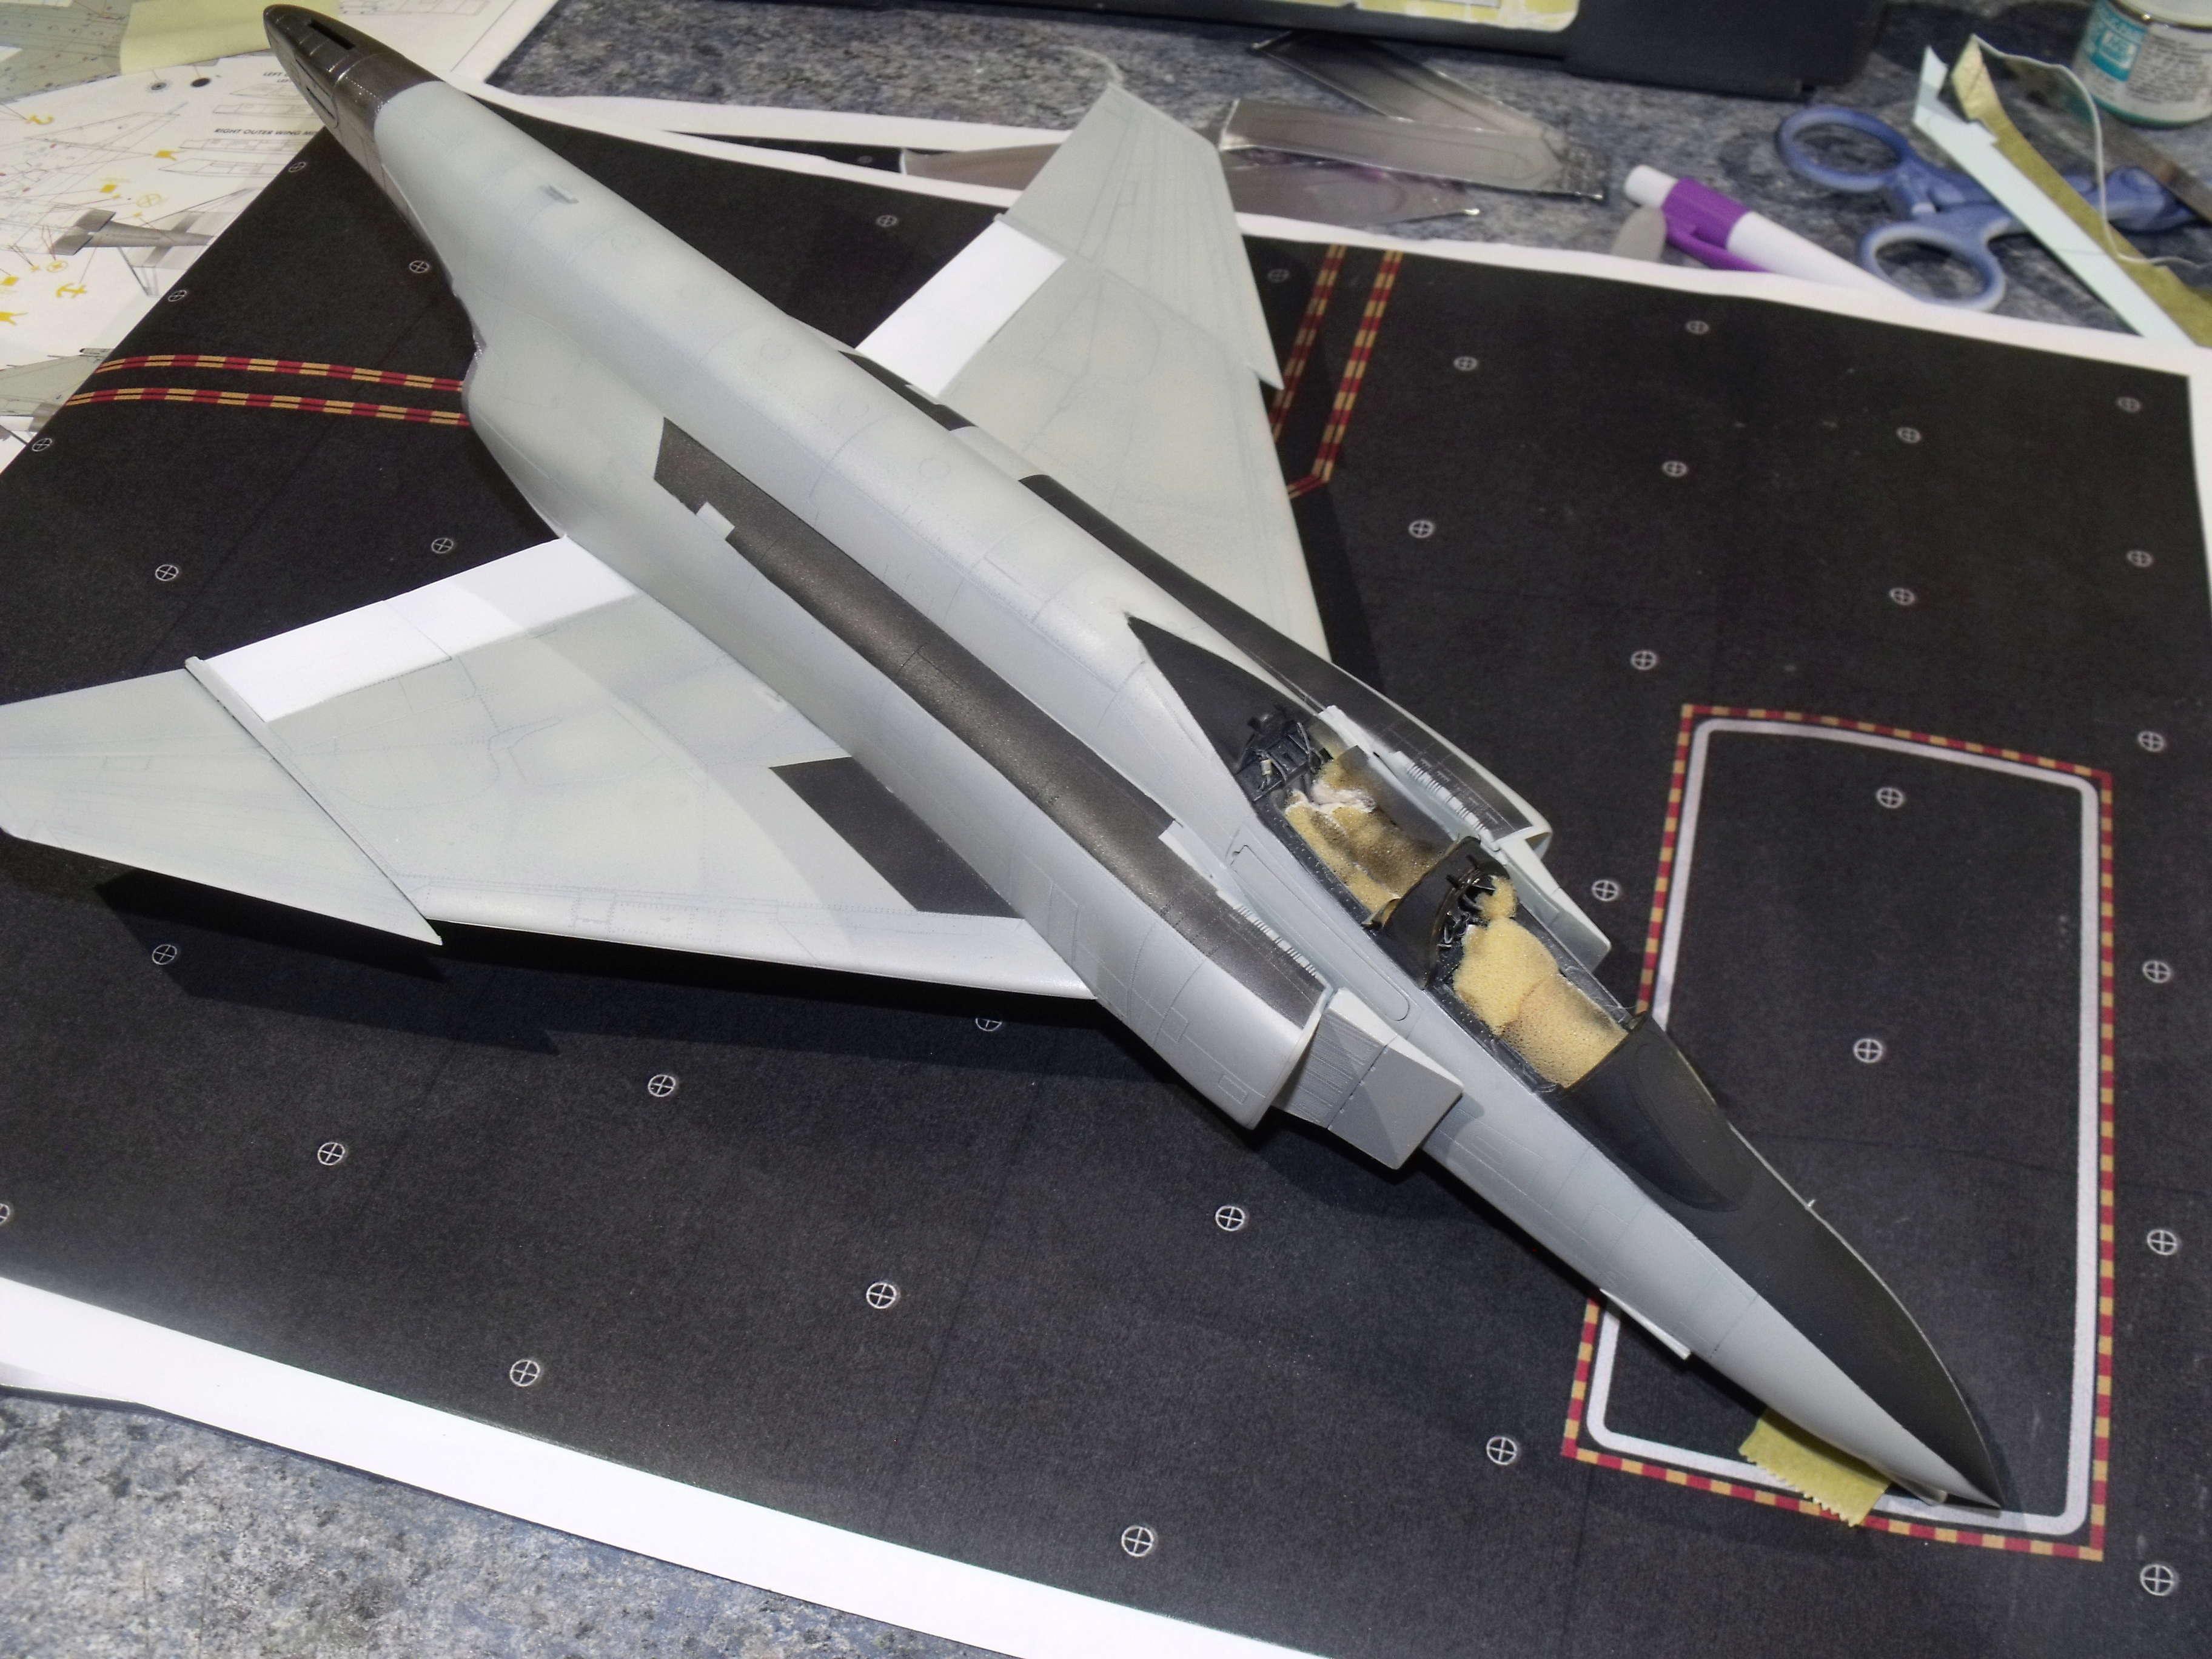 F-4 B Phantom 1/48° - VF-51 - 1972 - Début de patine. - Page 4 Dscf7139